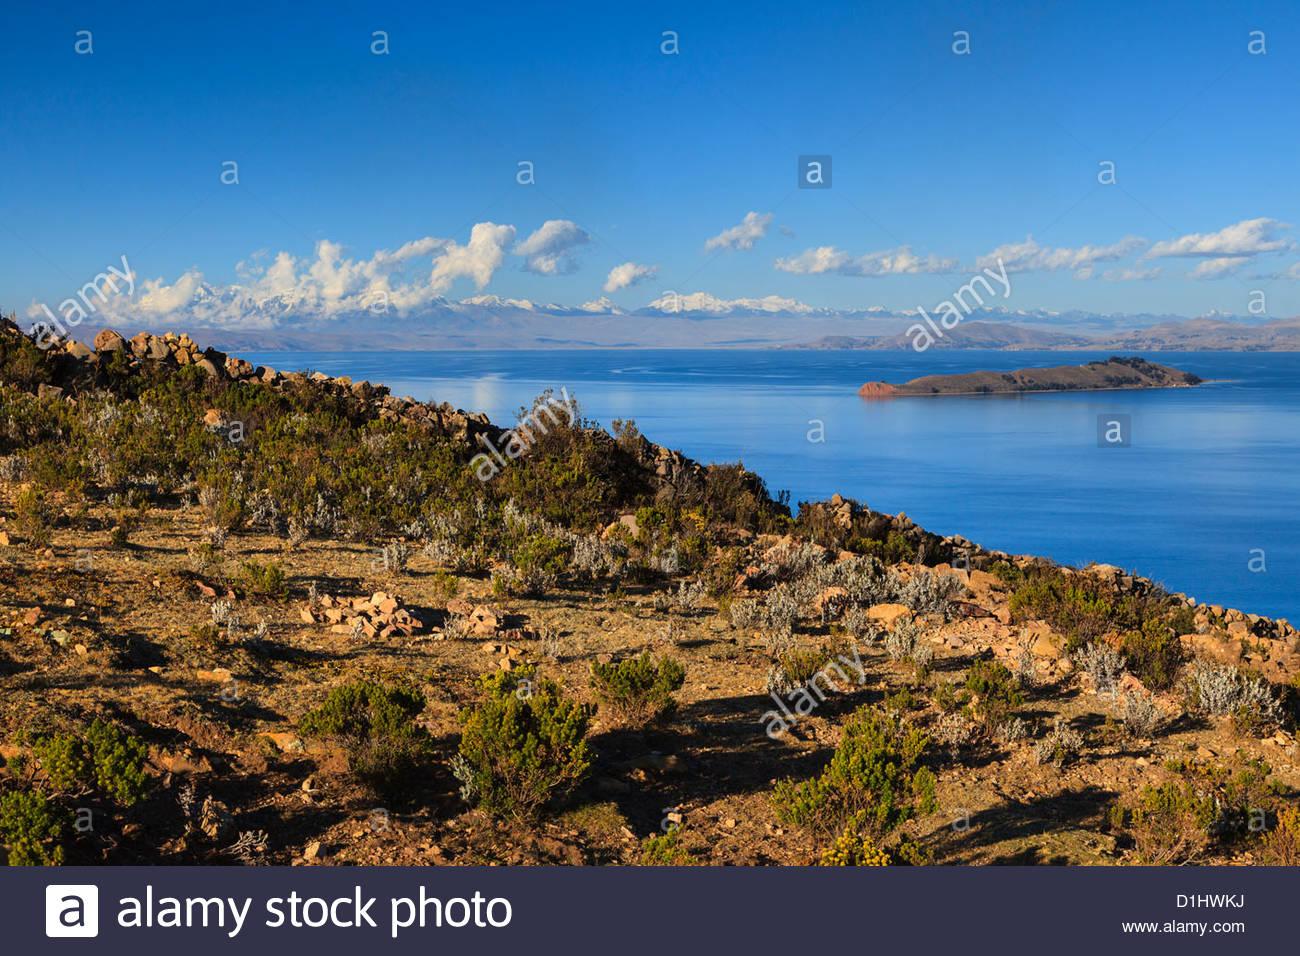 Isla del Sol on the Bolivian Side of Lake Titicaca, Bolivia. - Stock Image